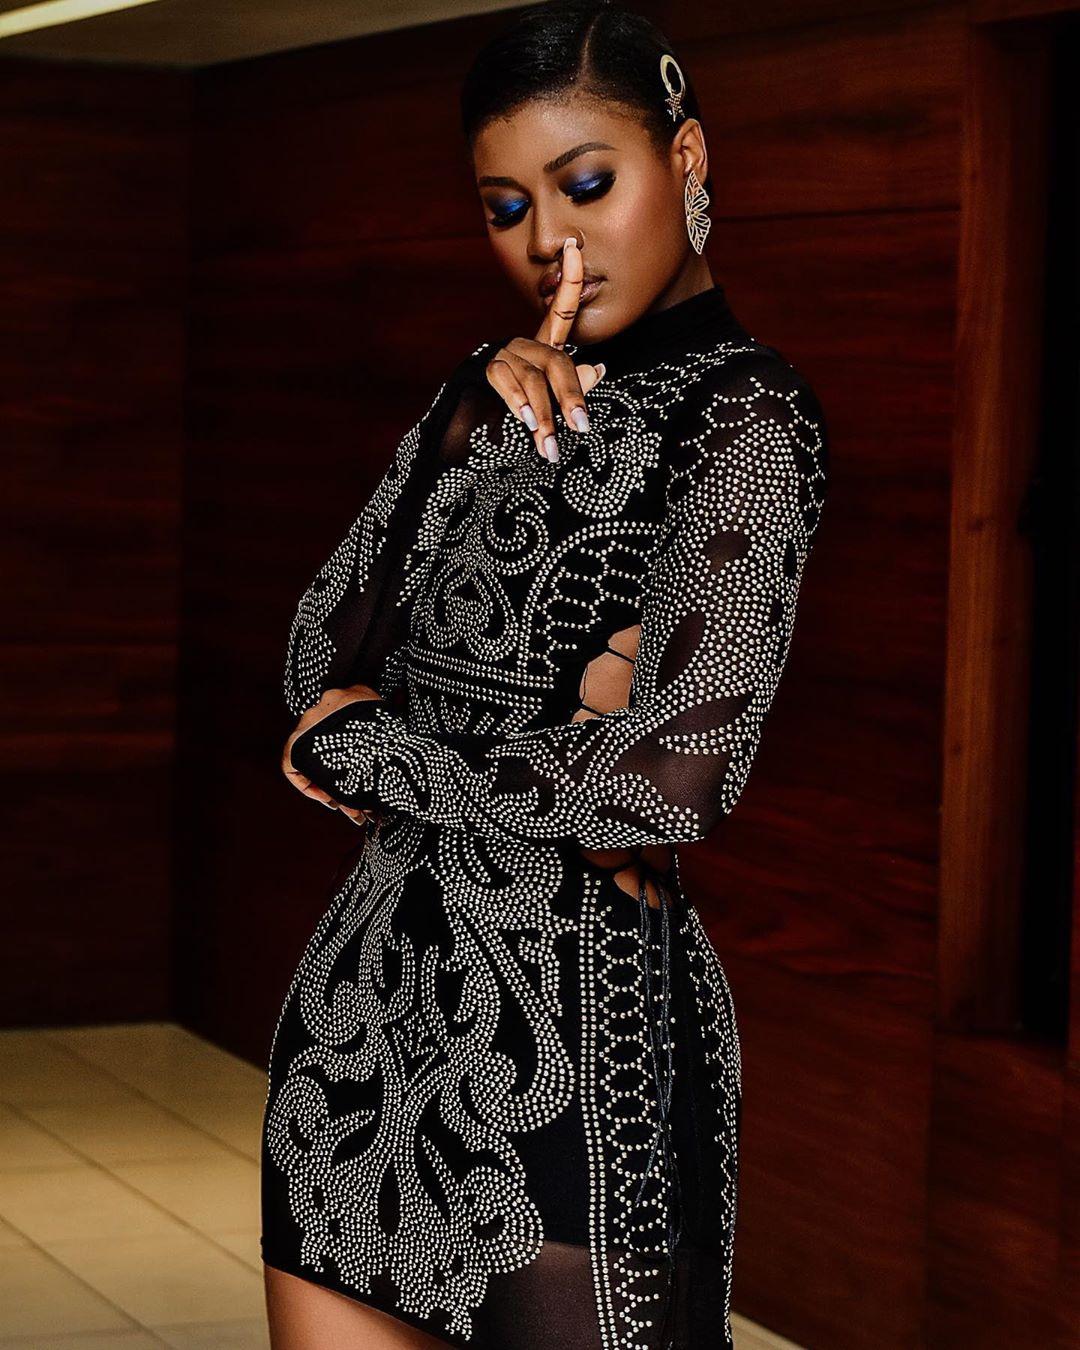 Alex Asogwa Unique Black Dress Is Fashionable Enough For All Event